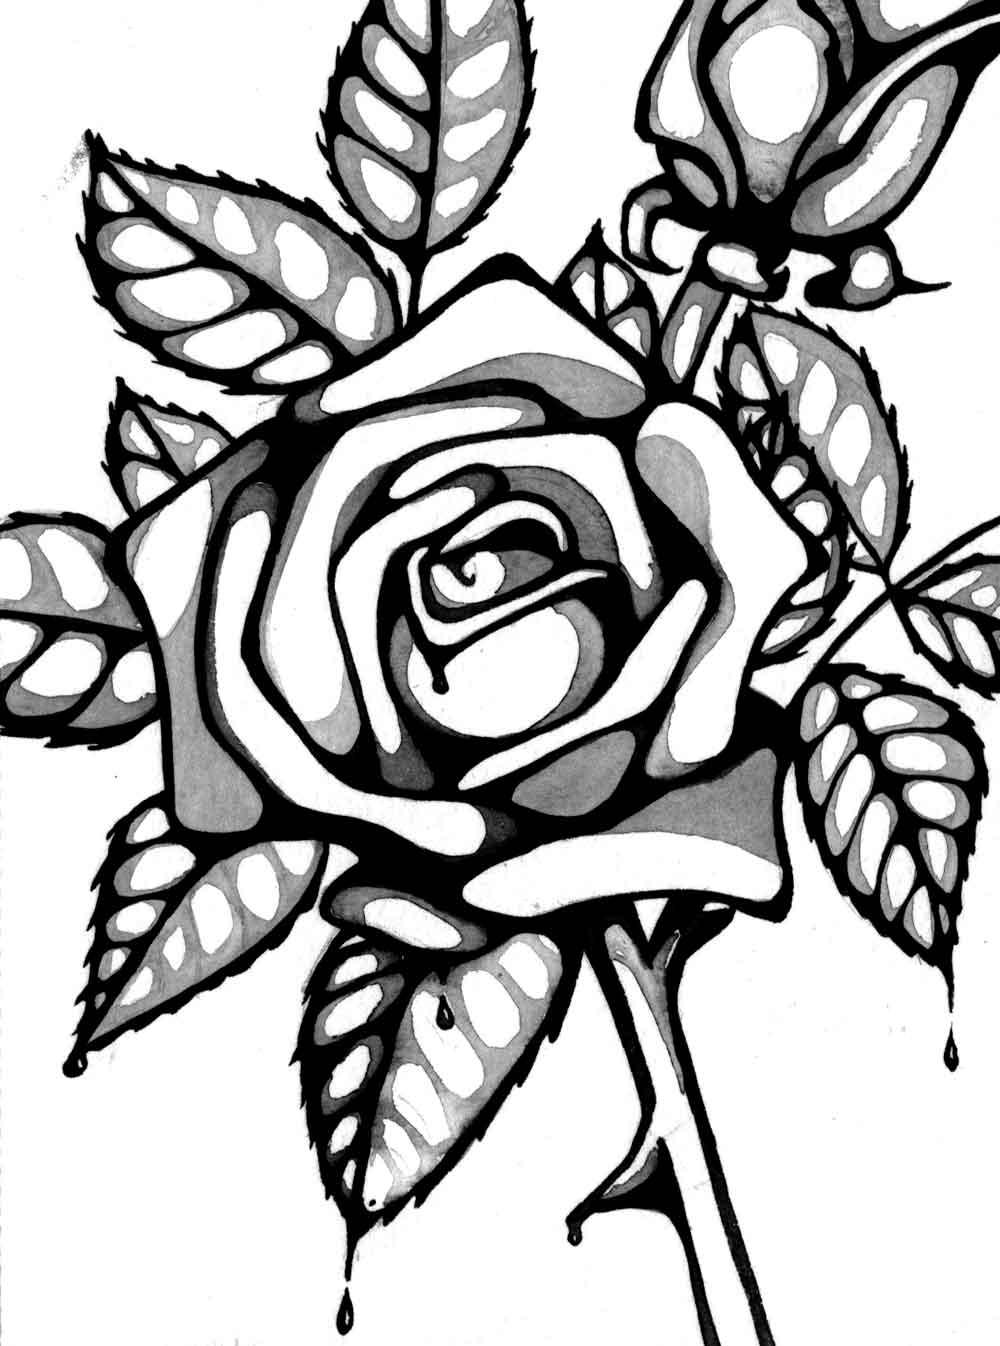 Line Art Of Rose : Rose line drawings clipart best